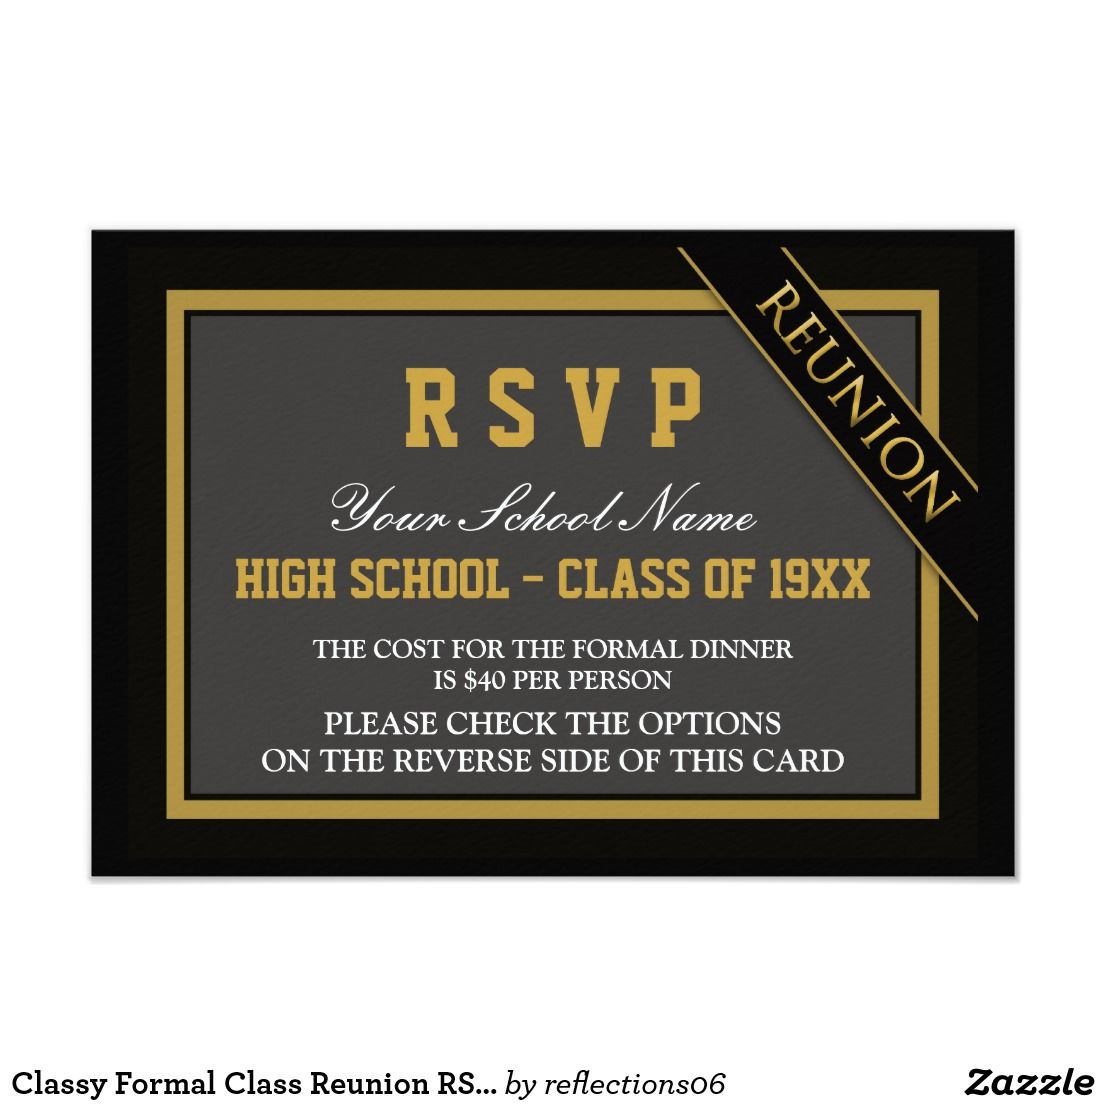 Classy Formal Class Reunion Rsvp